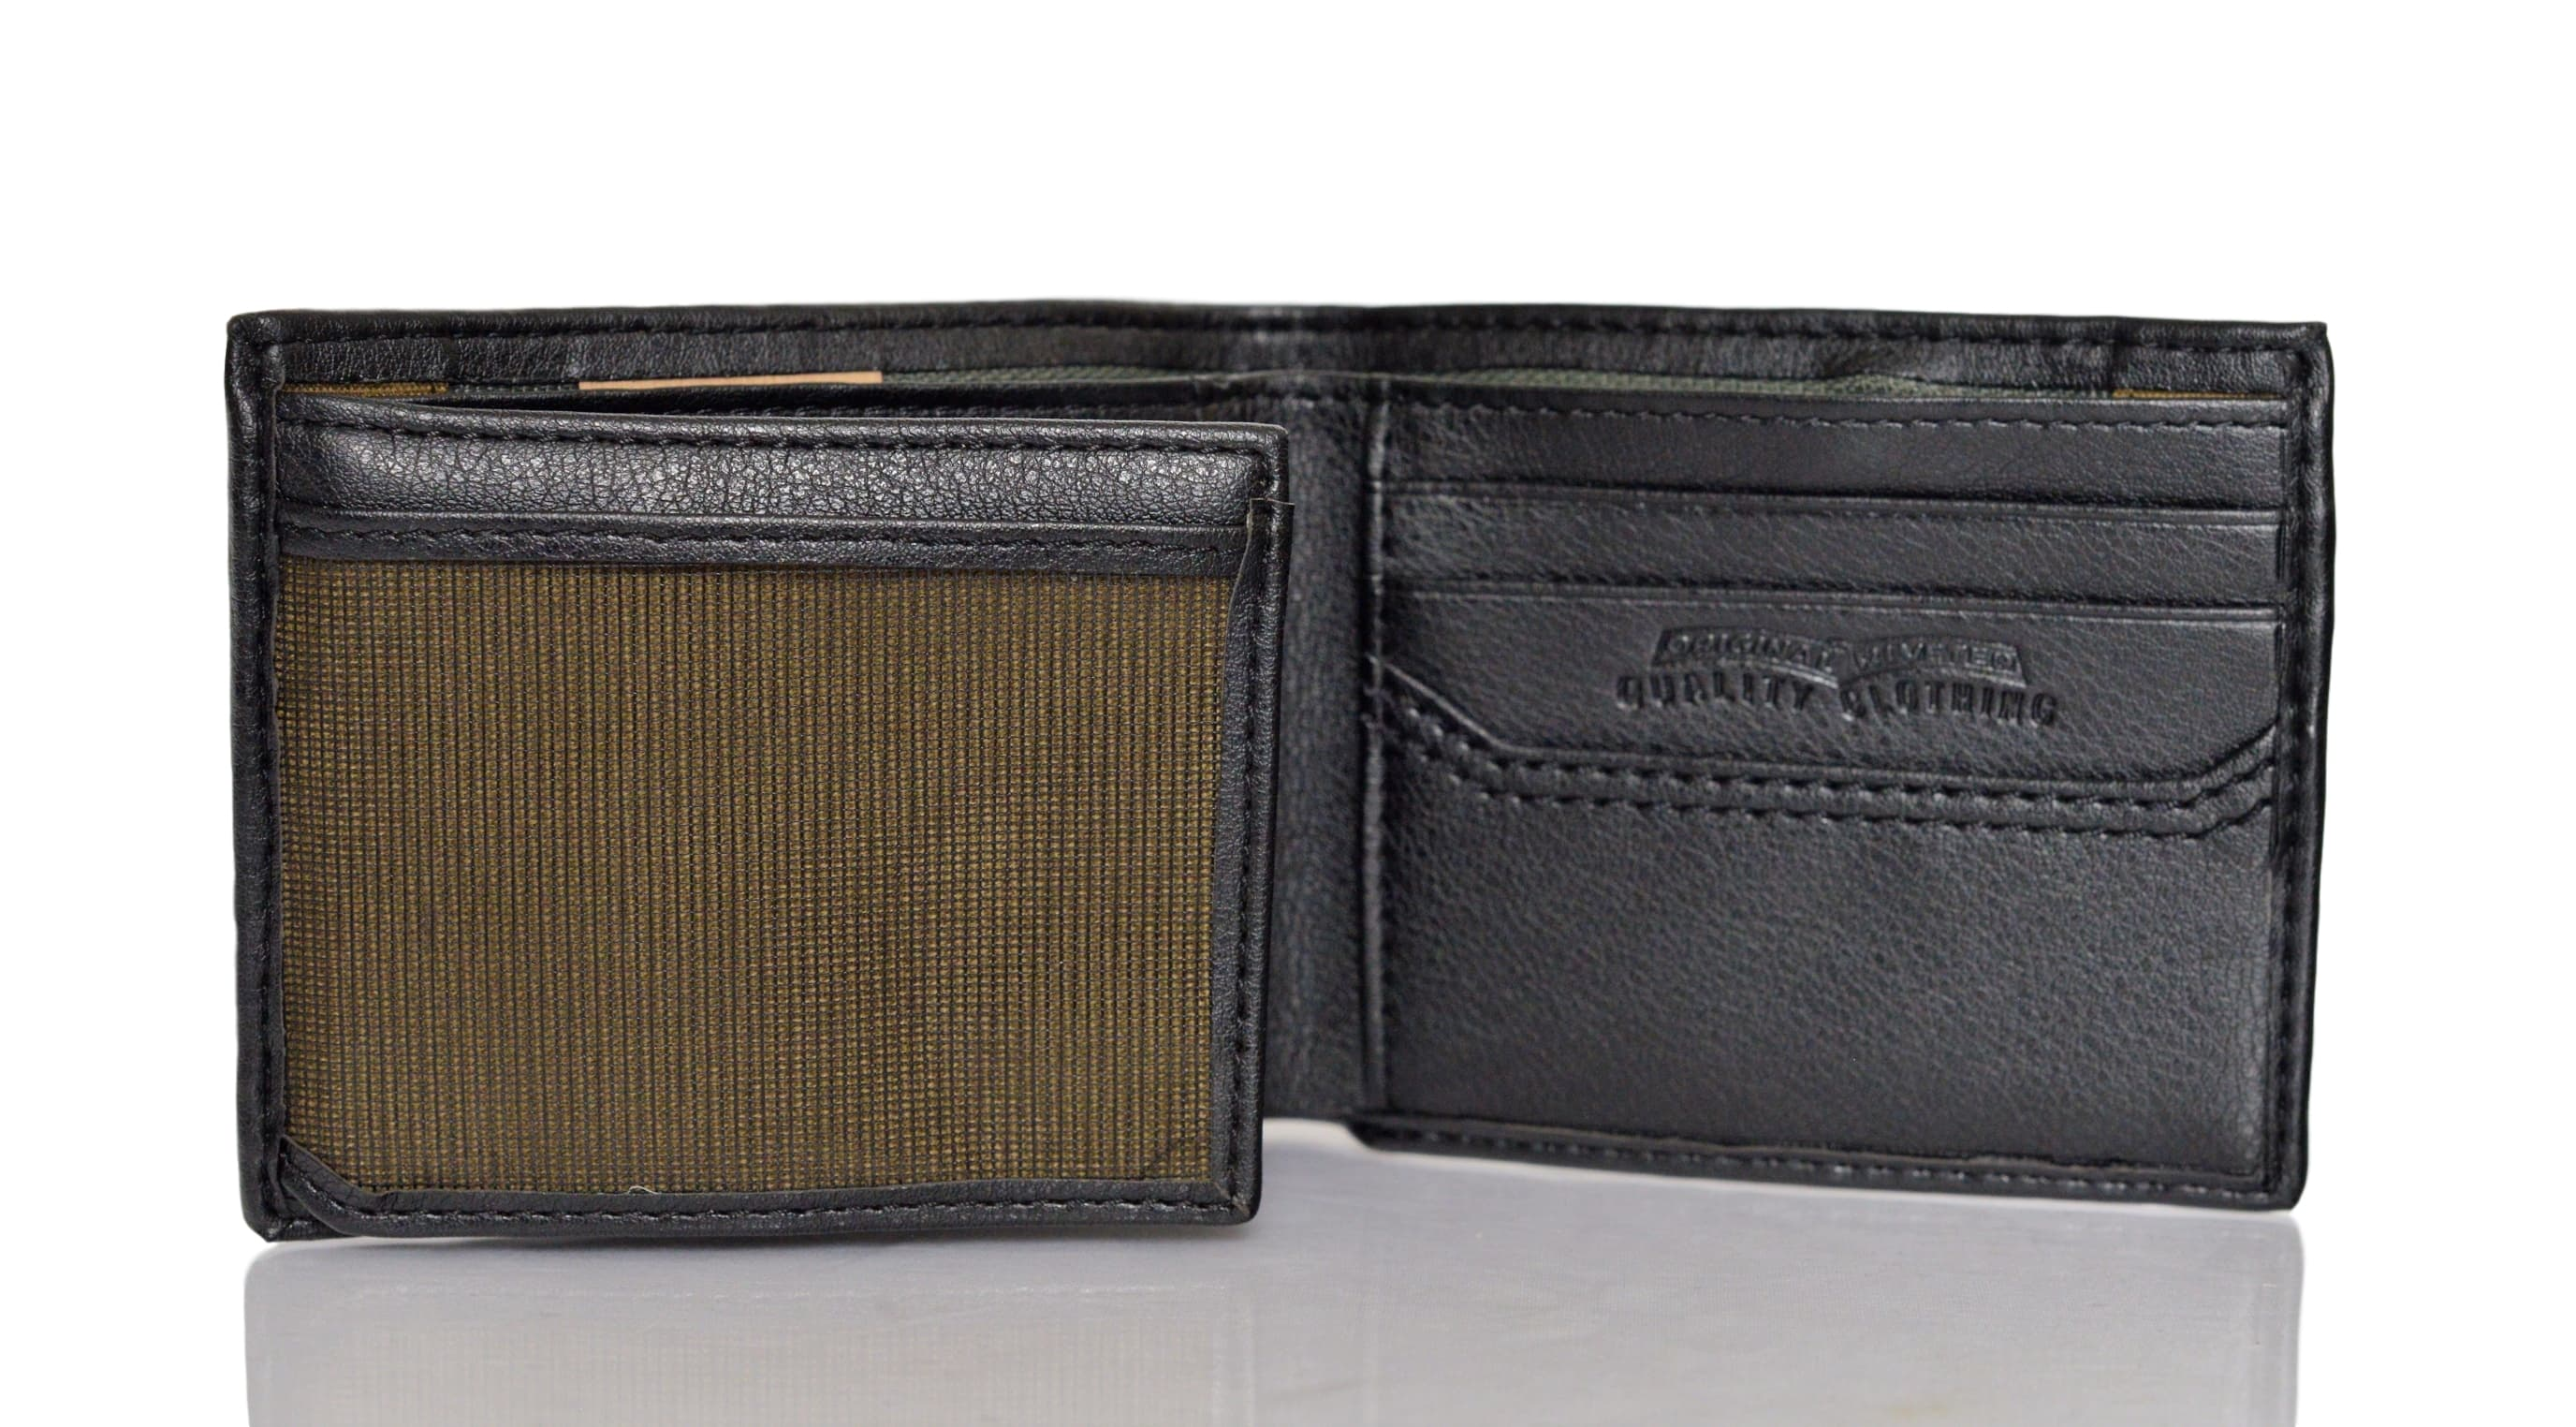 Levi 39 S Traveler Men 39 S Bifold Leather Wallet With Interior Zipper Ebay